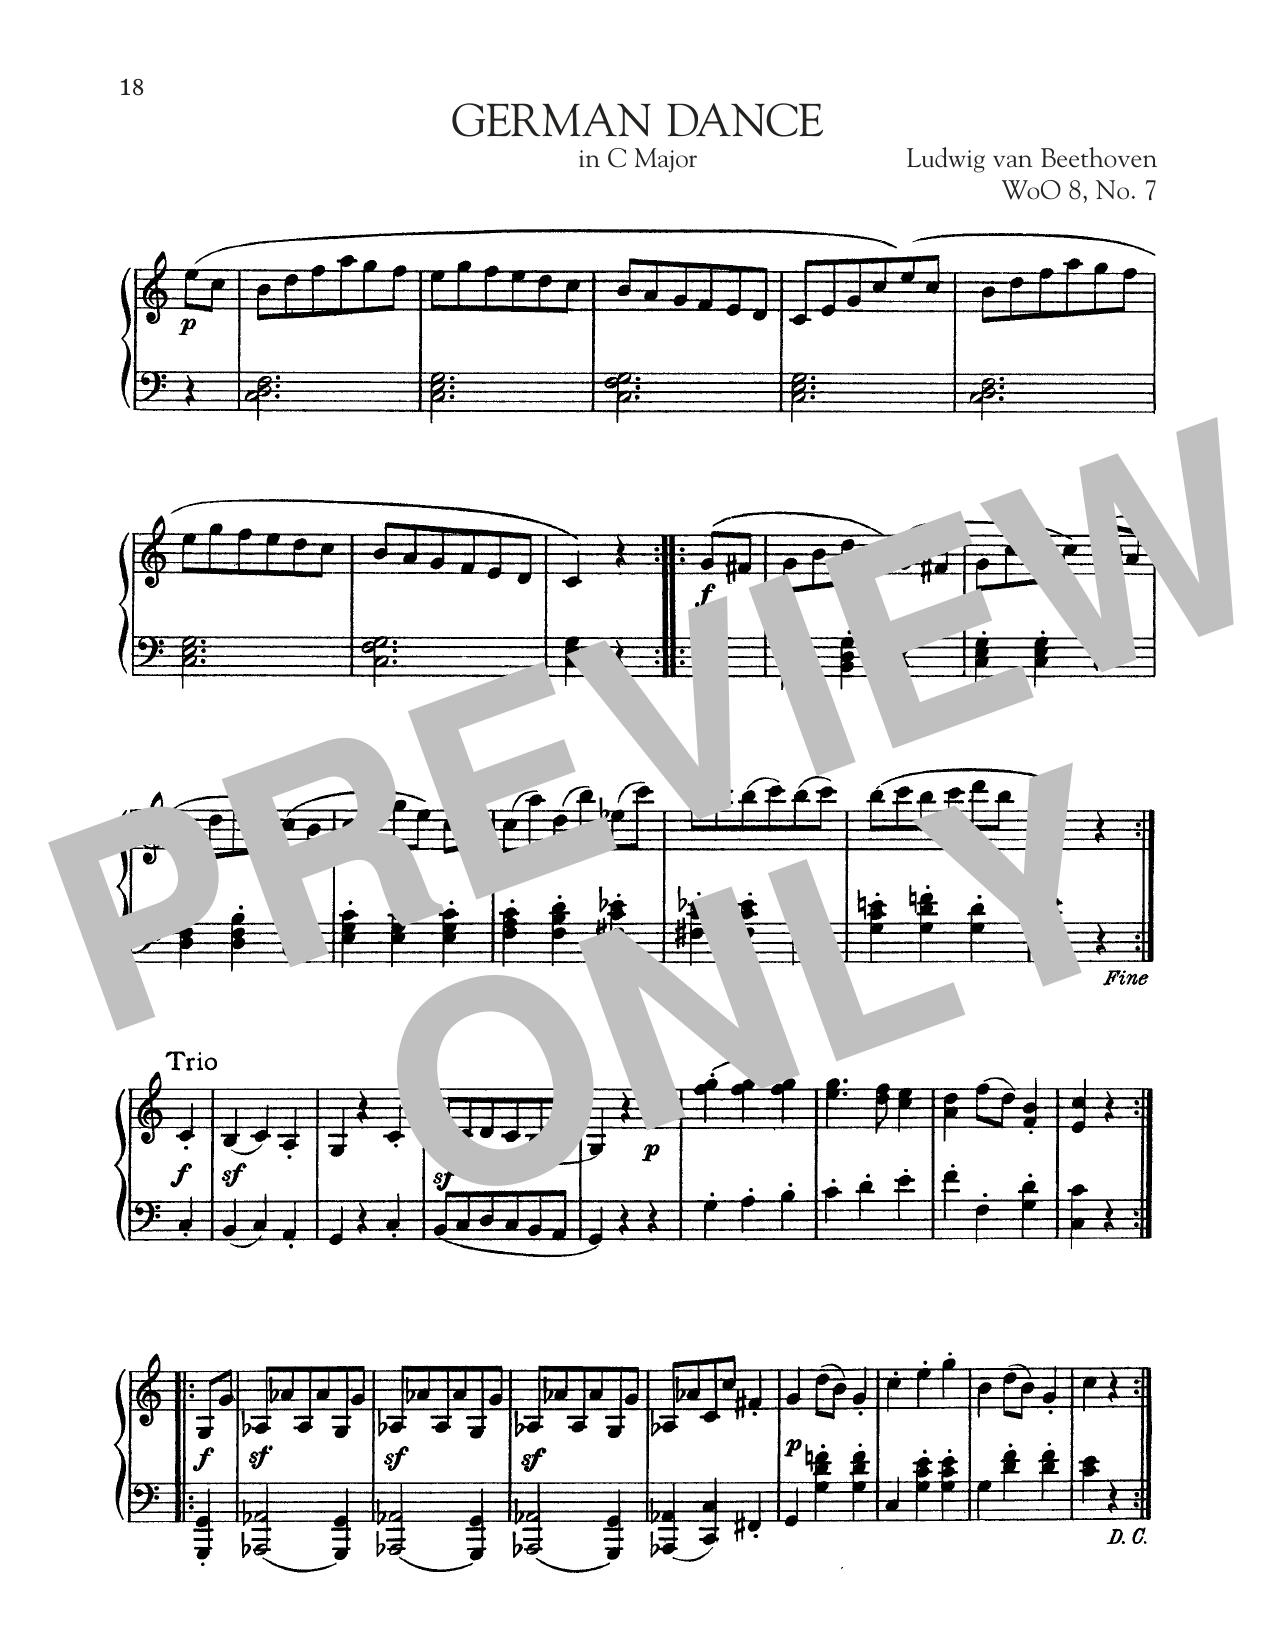 Ludwig van Beethoven German Dance In C Major, WoO 8, No. 1 sheet music notes and chords. Download Printable PDF.